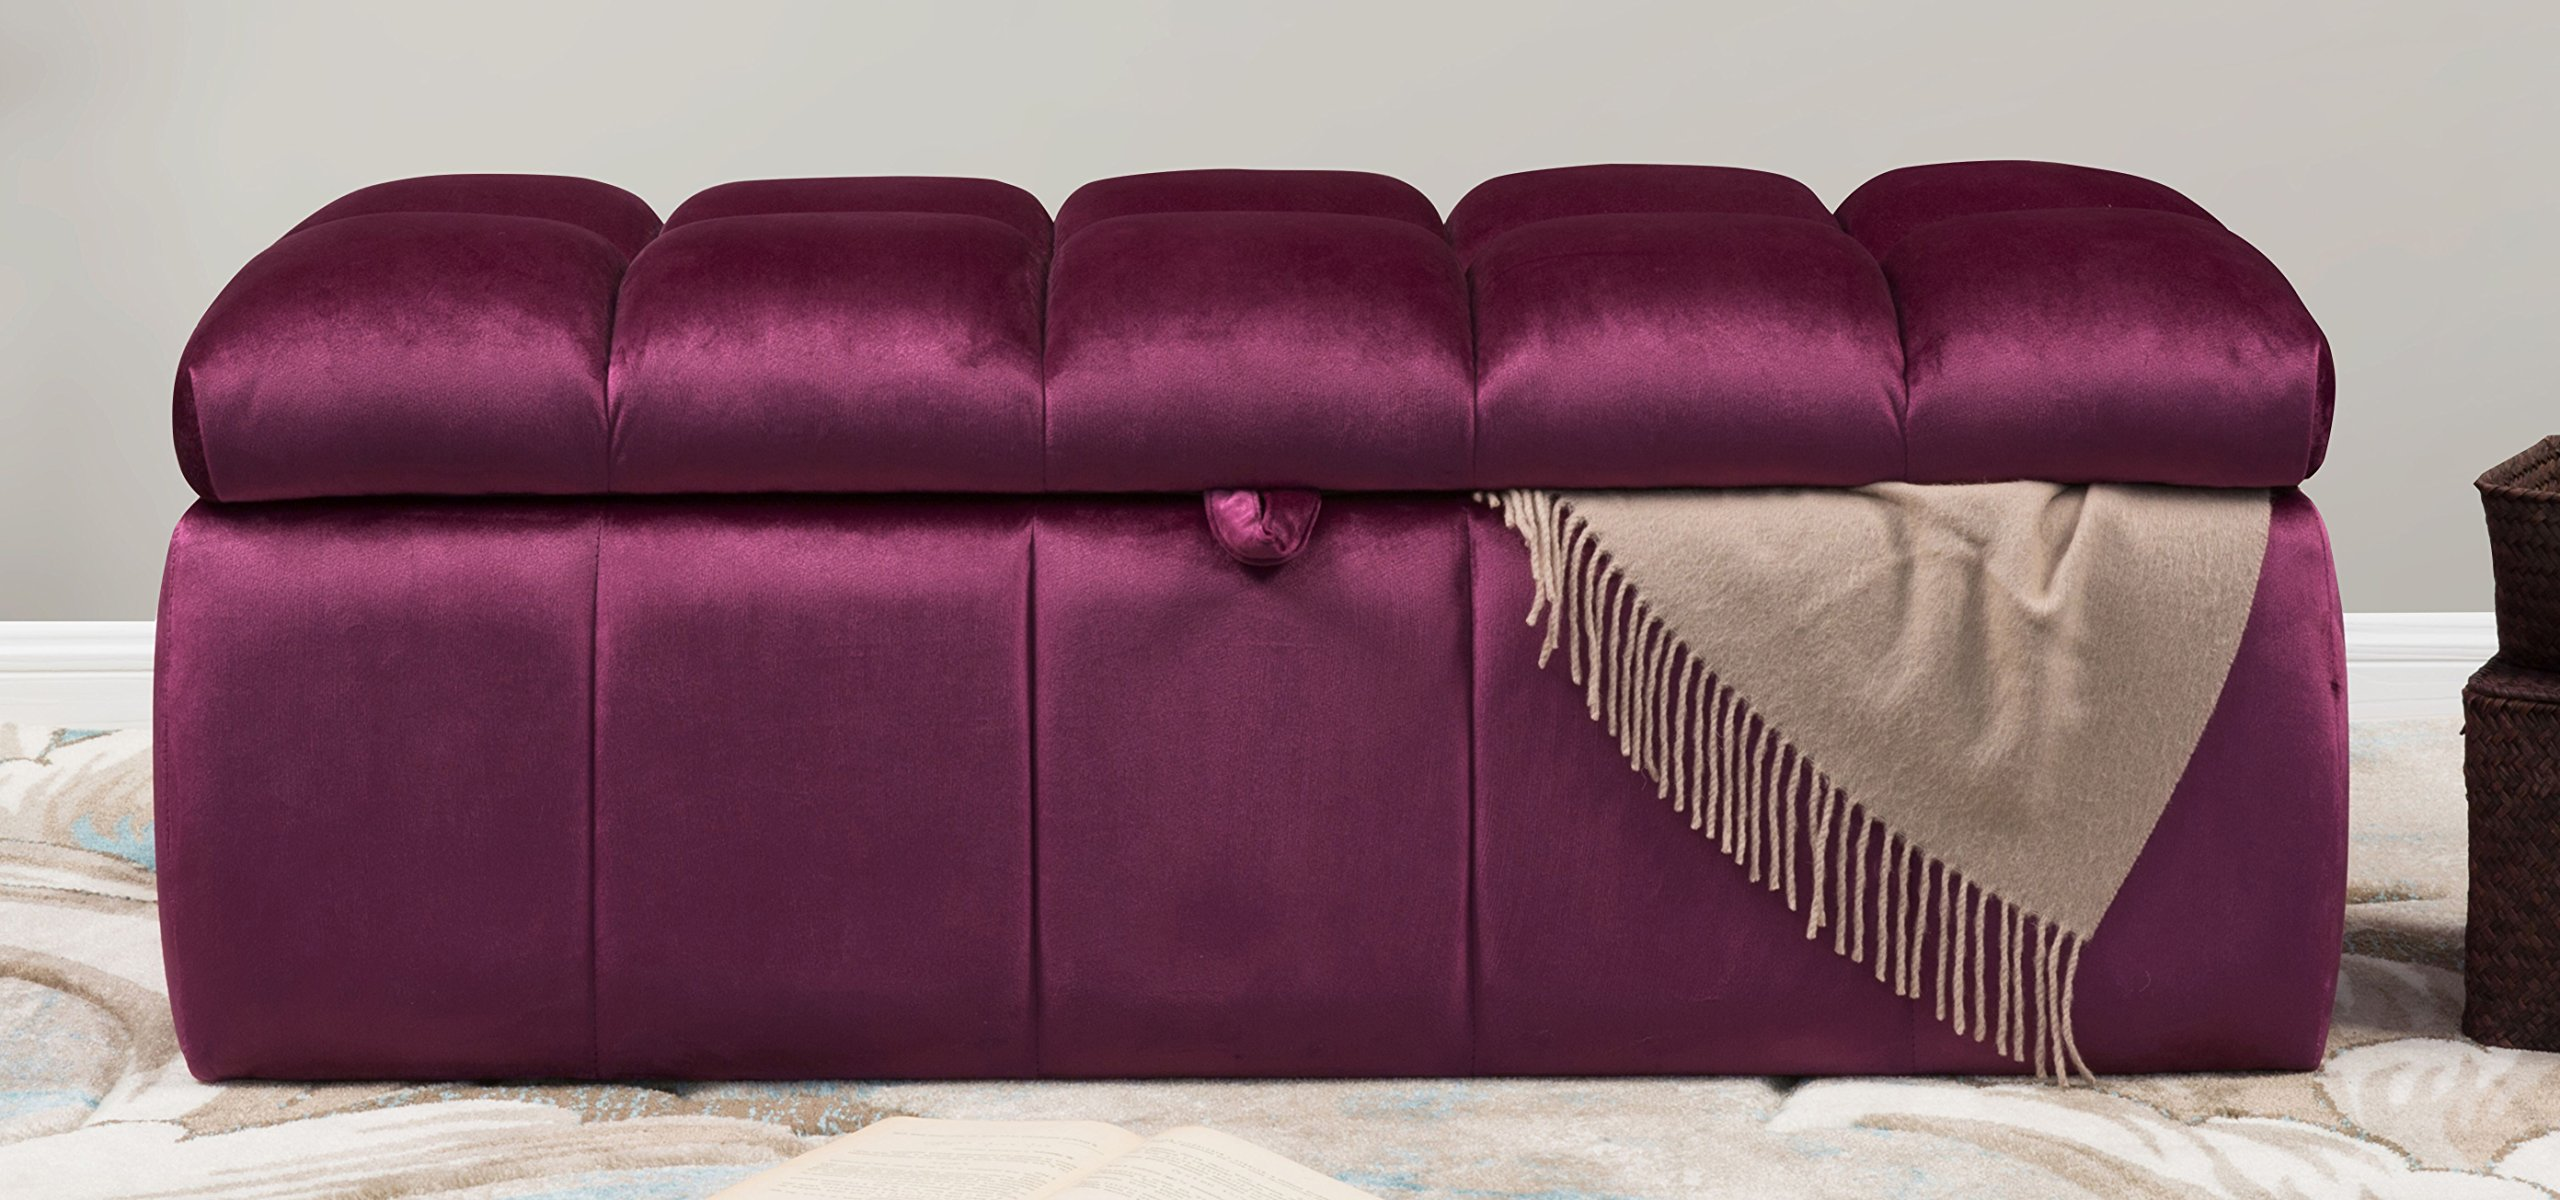 Iconic Home Chagit Bench Velvet Tufted Storage Ottoman, Plum